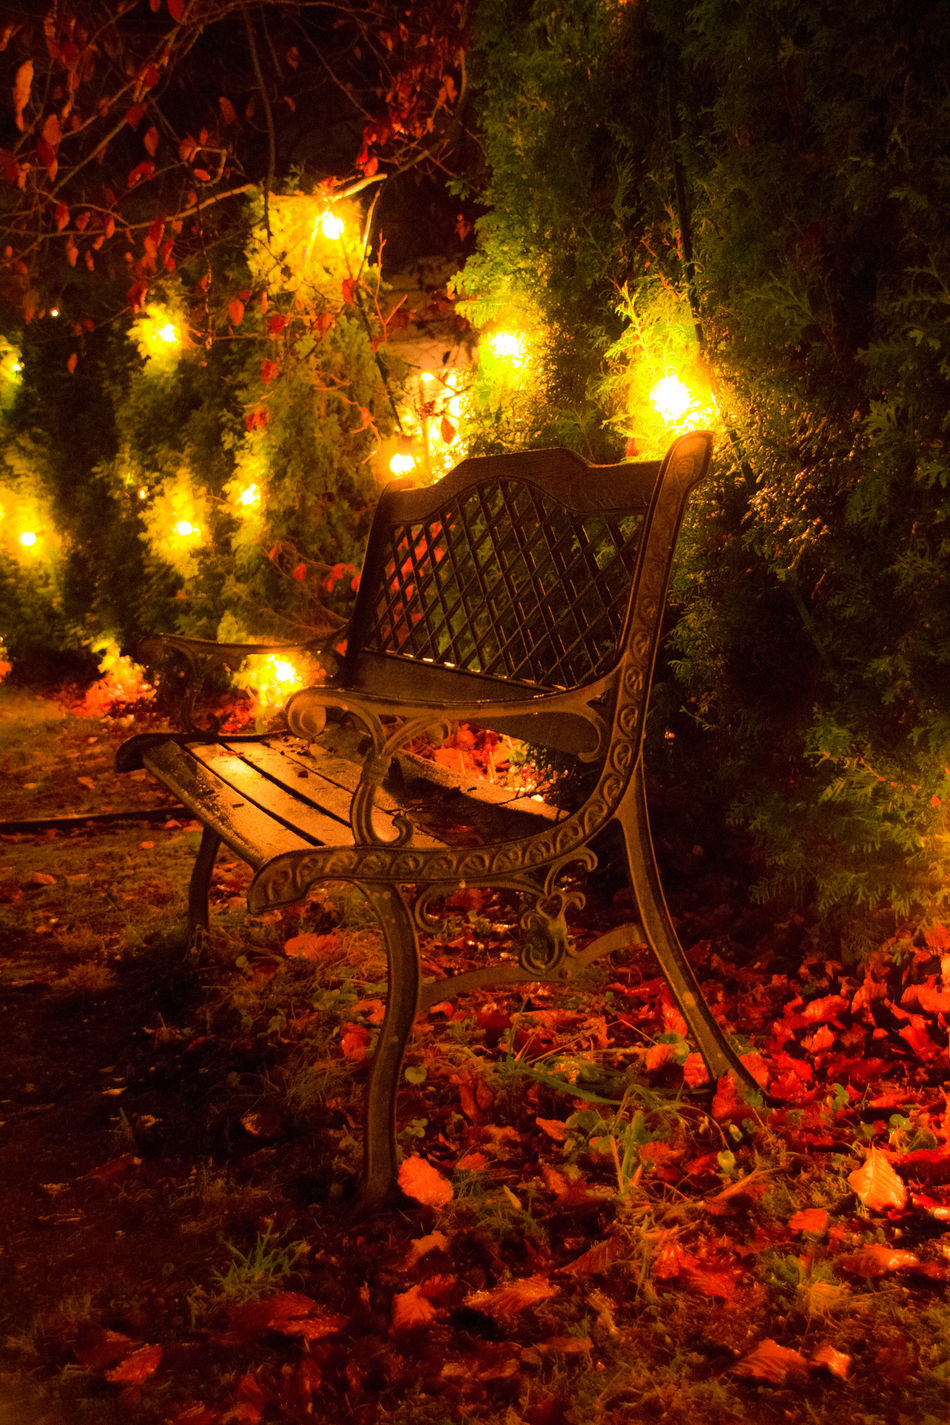 #Christmas #ChristmasLights #christmastime #Dark Clouds #market #nightfall #romantic #tree